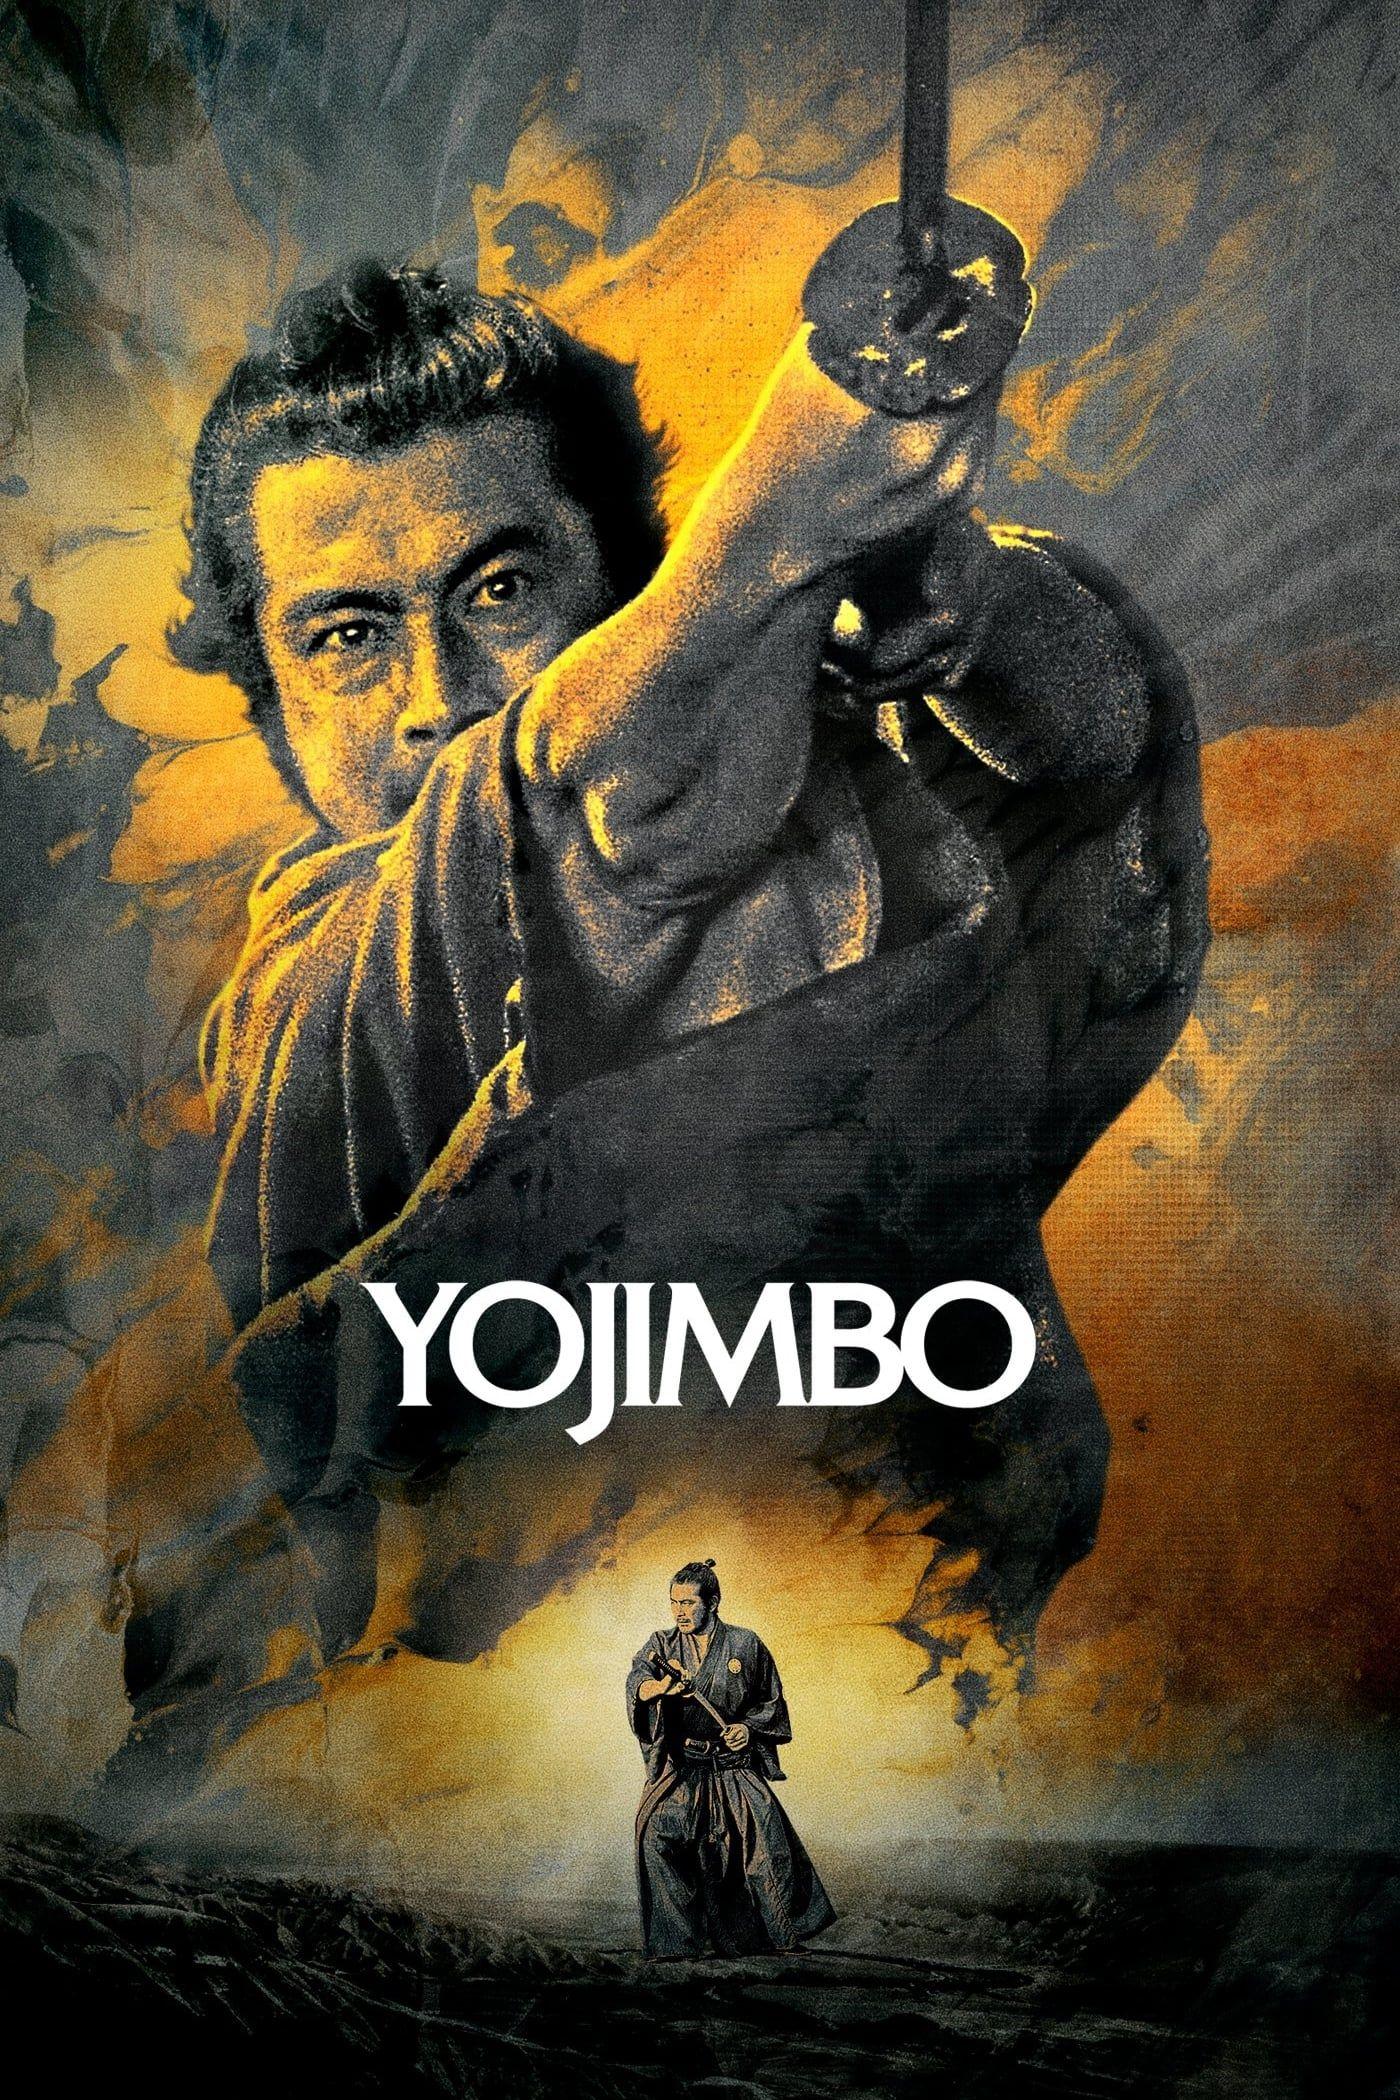 Yojimbo 1961 Dir Akira Kurosawa Full Movies Streaming Movies New Movies To Watch